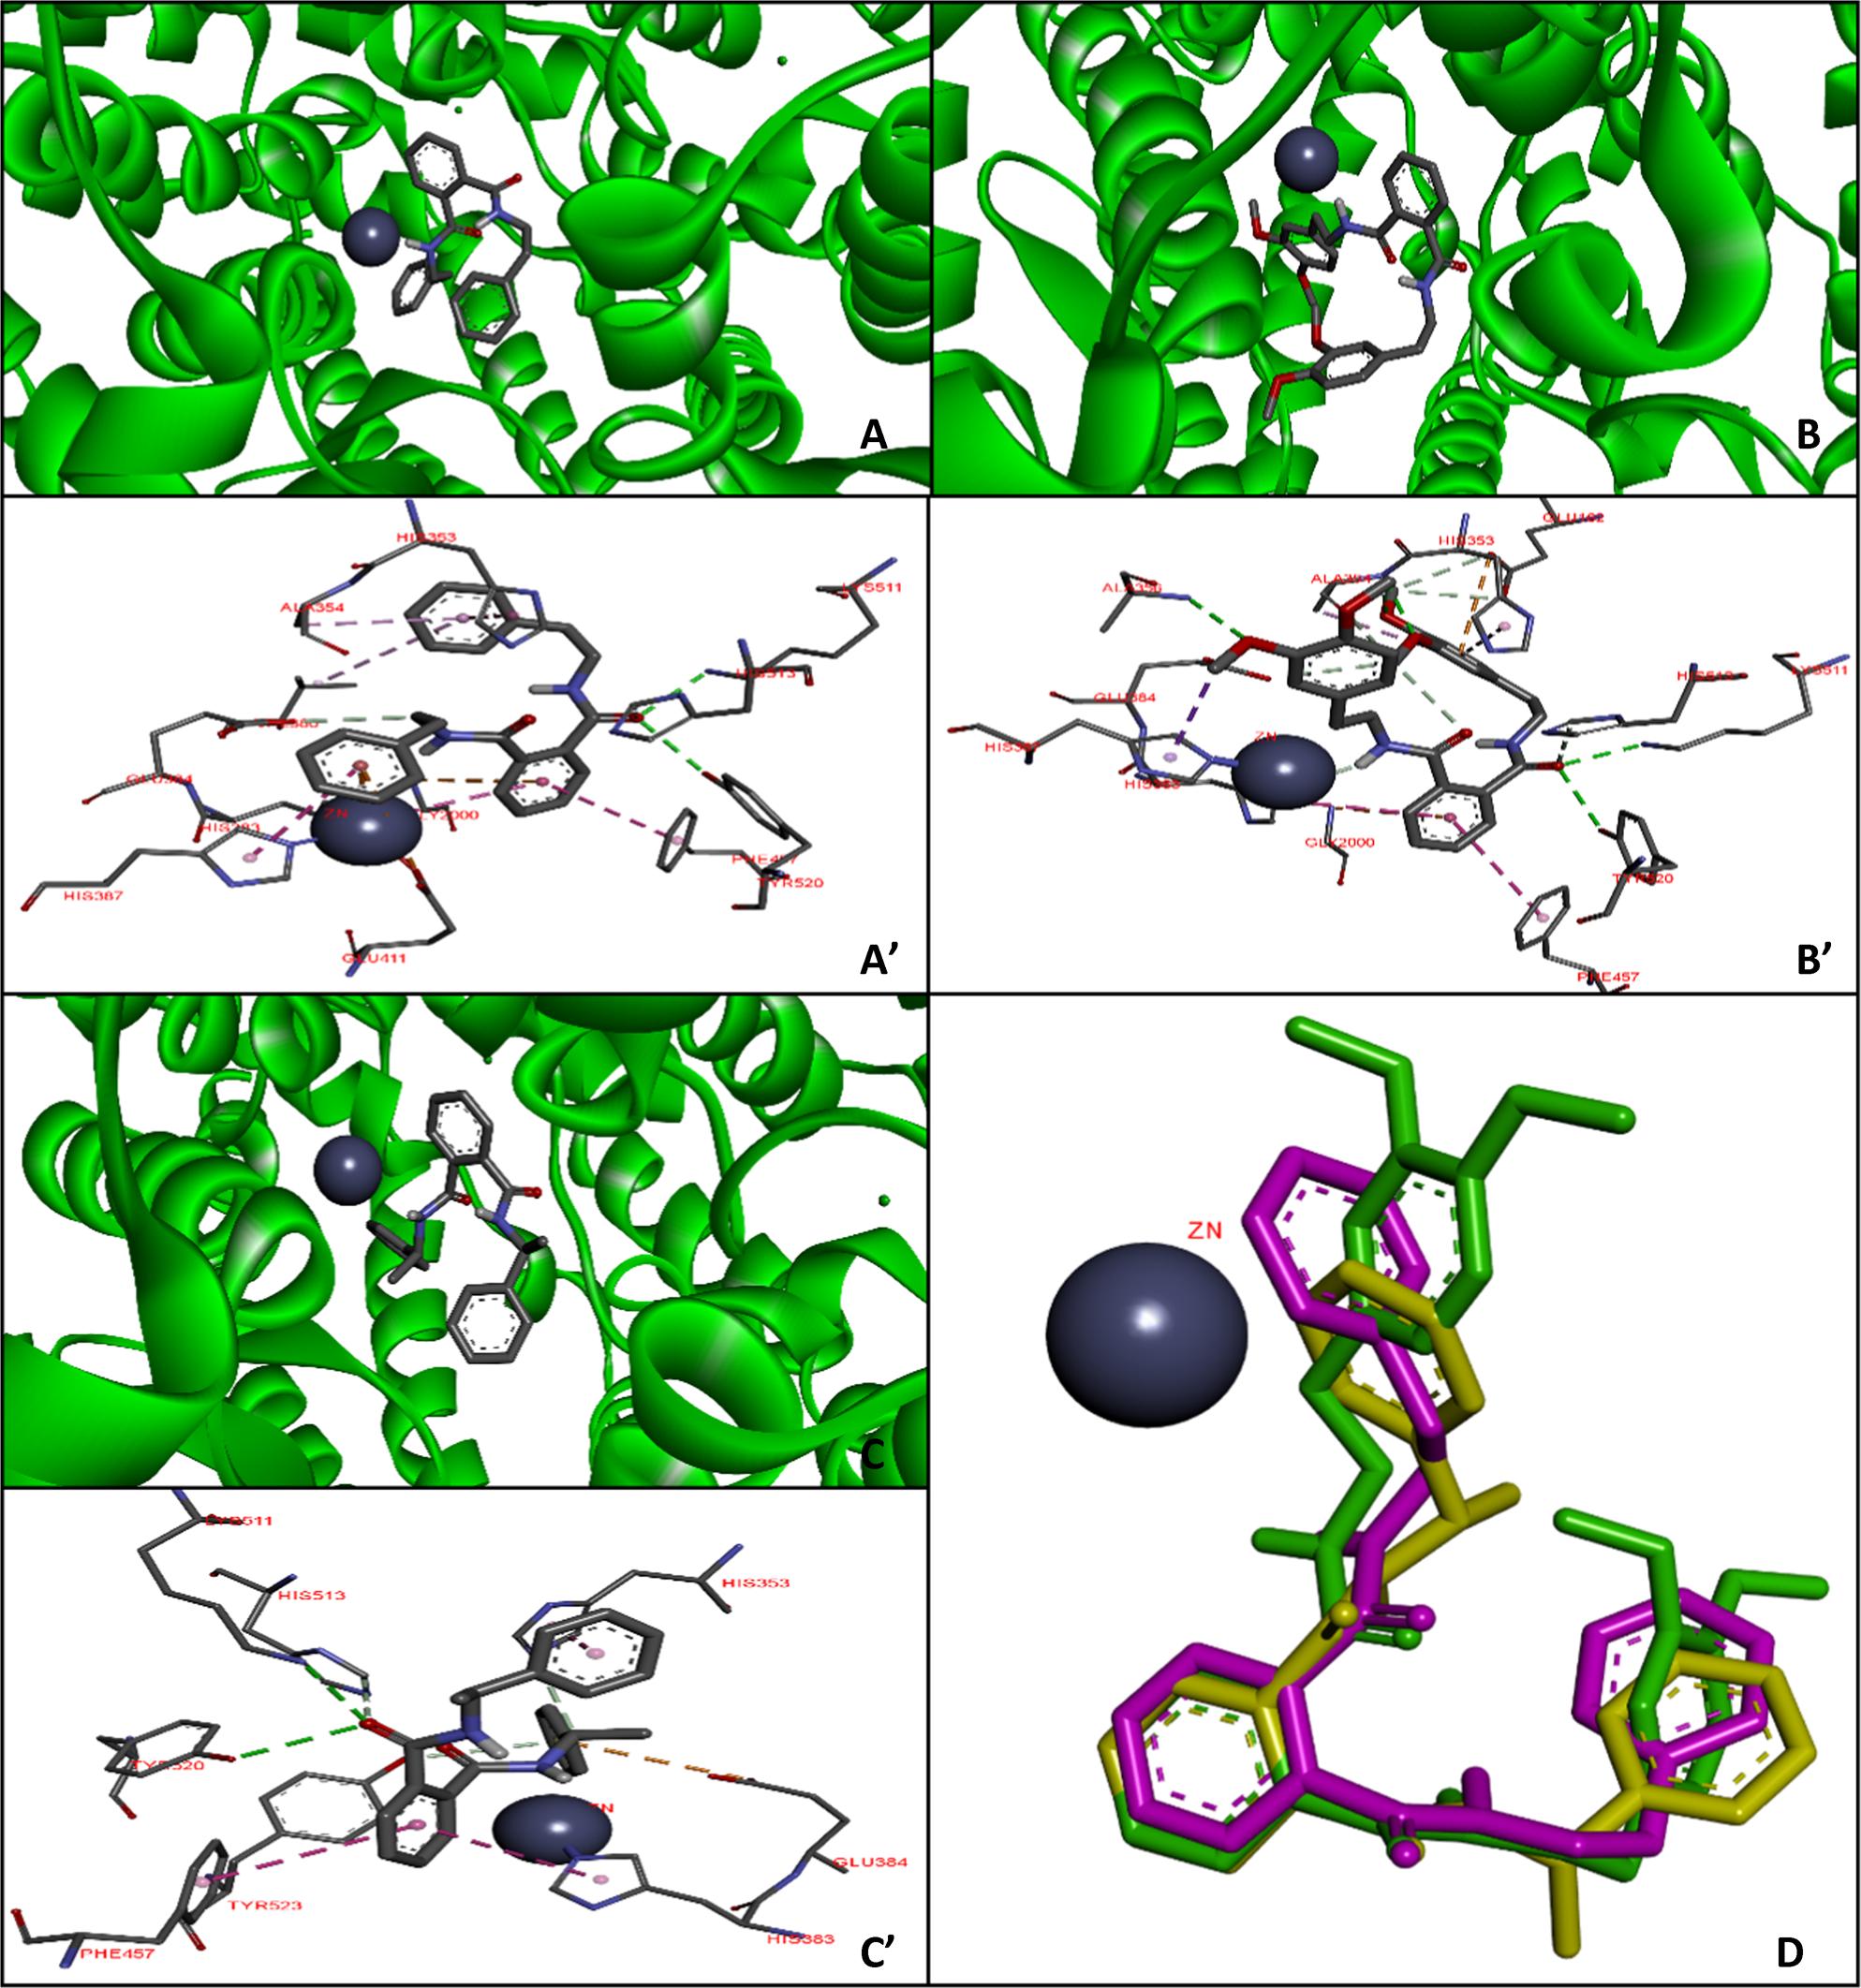 Novel phthalamide derivatives as antihypertensive agents